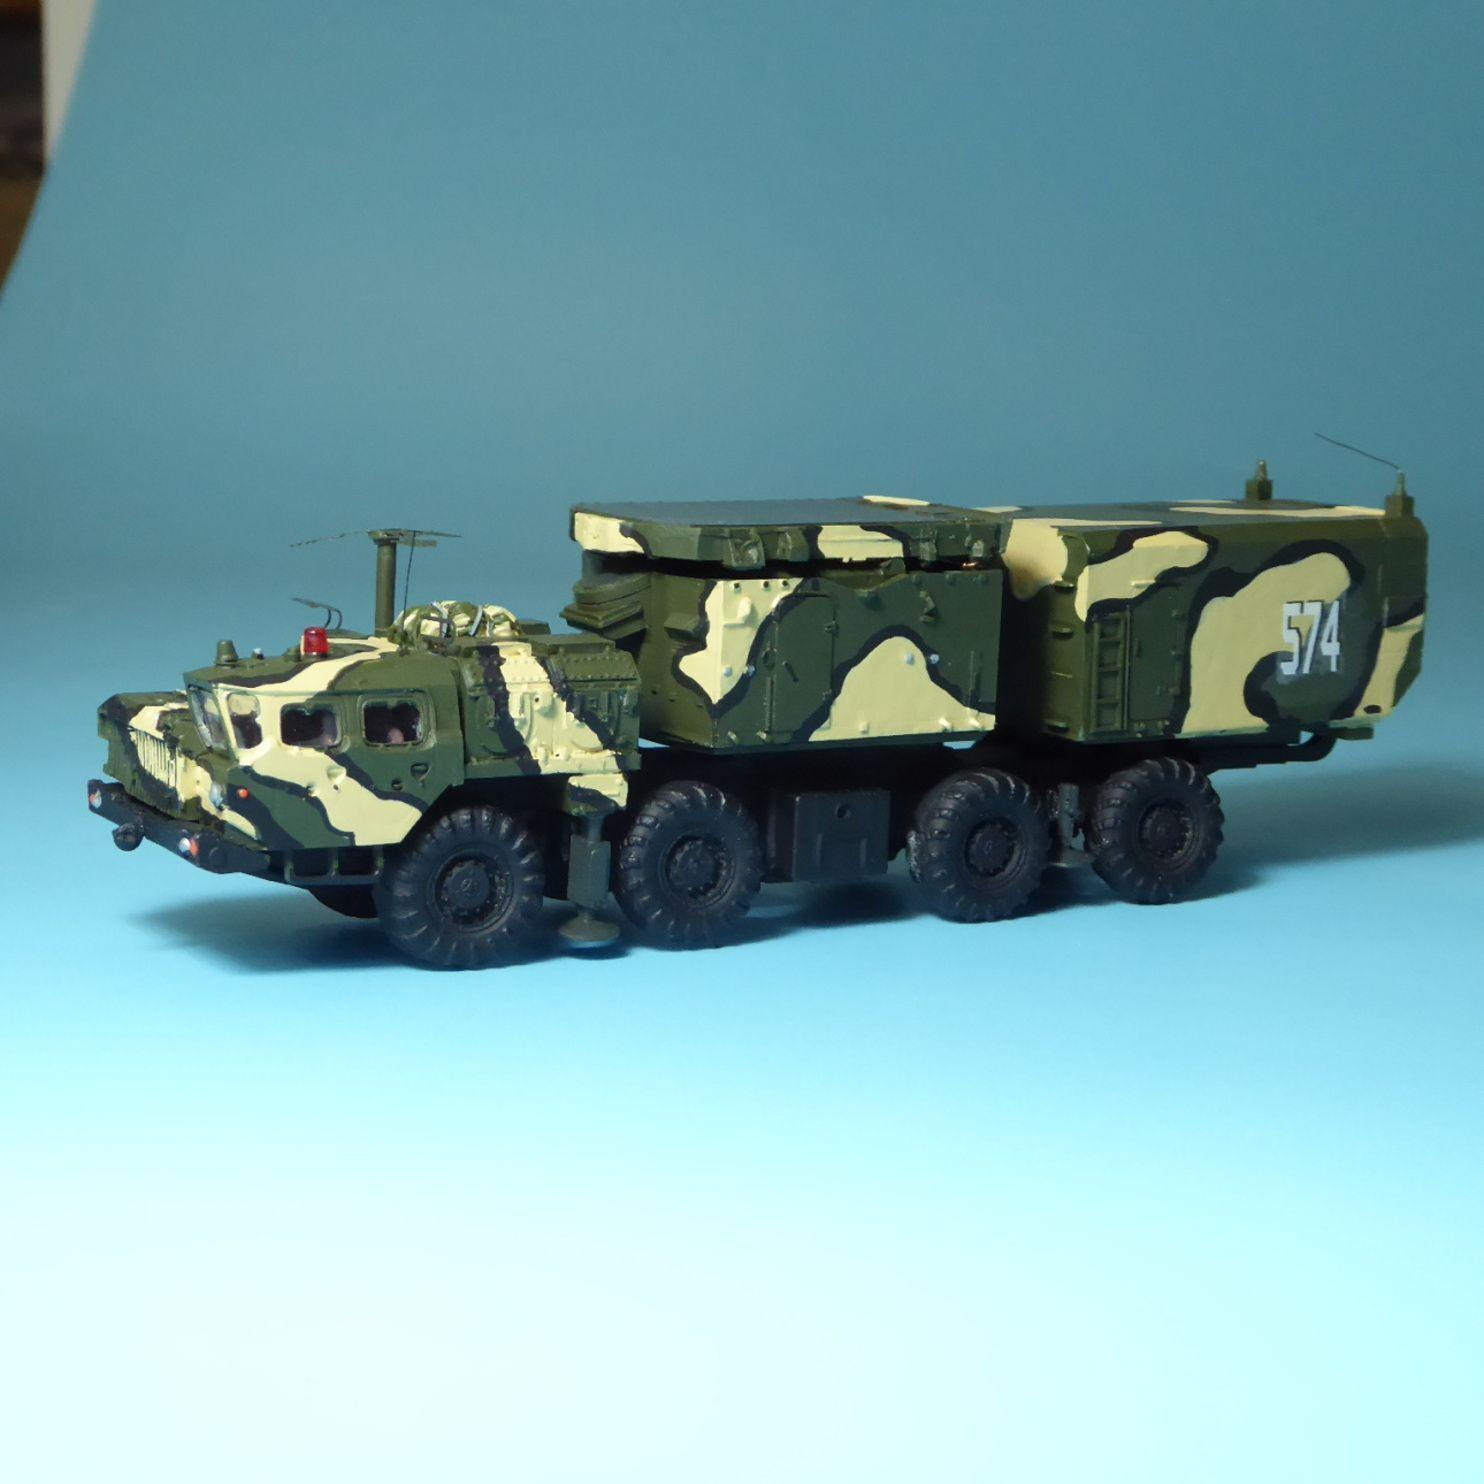 RK modelos maz 543 s 300 radar rpn30-noe NVA sq urss DDR, h0, 1 87, militar